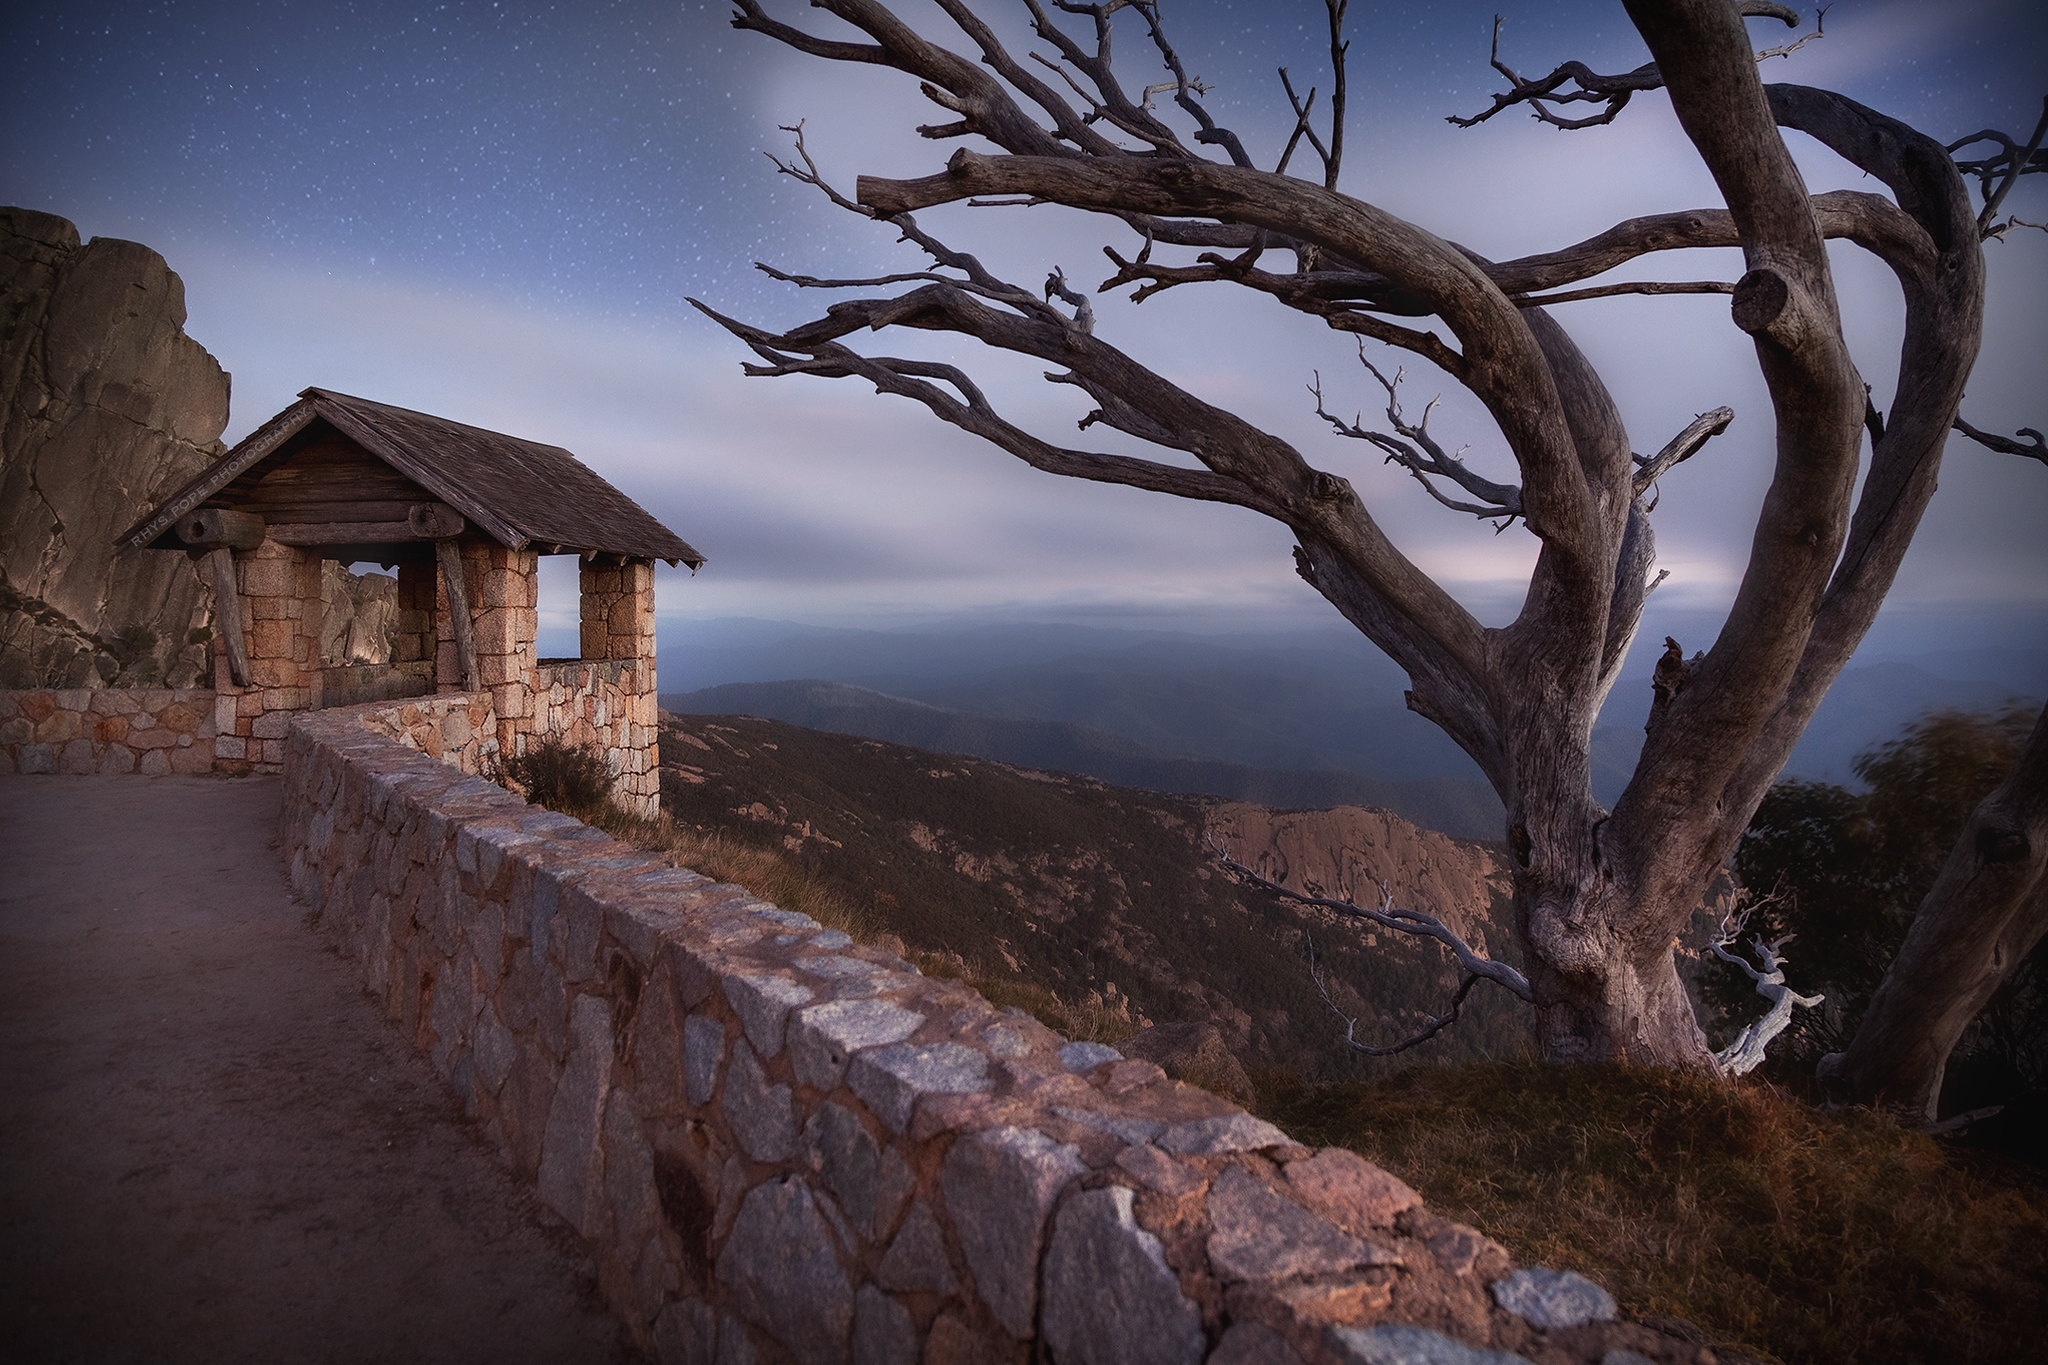 General 2048x1365 Australia trees Mount Buffalo (Australia) outdoors